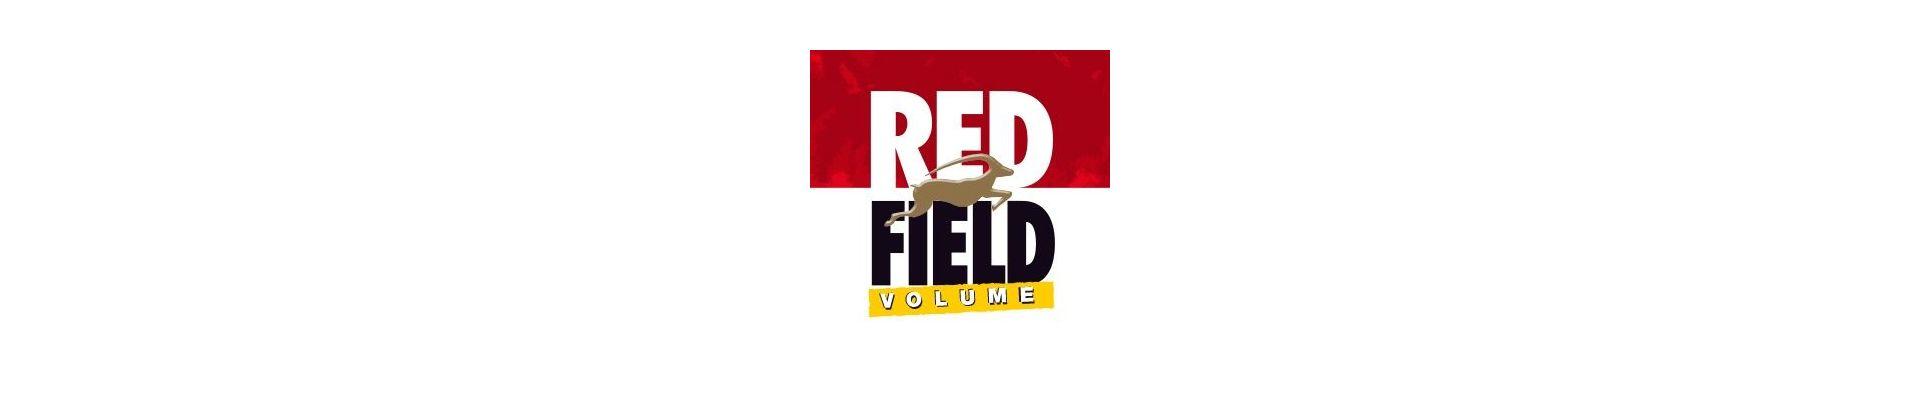 Tutun pentru injectat in tuburi Red Field.Magazin online tuburi si tutun injectat